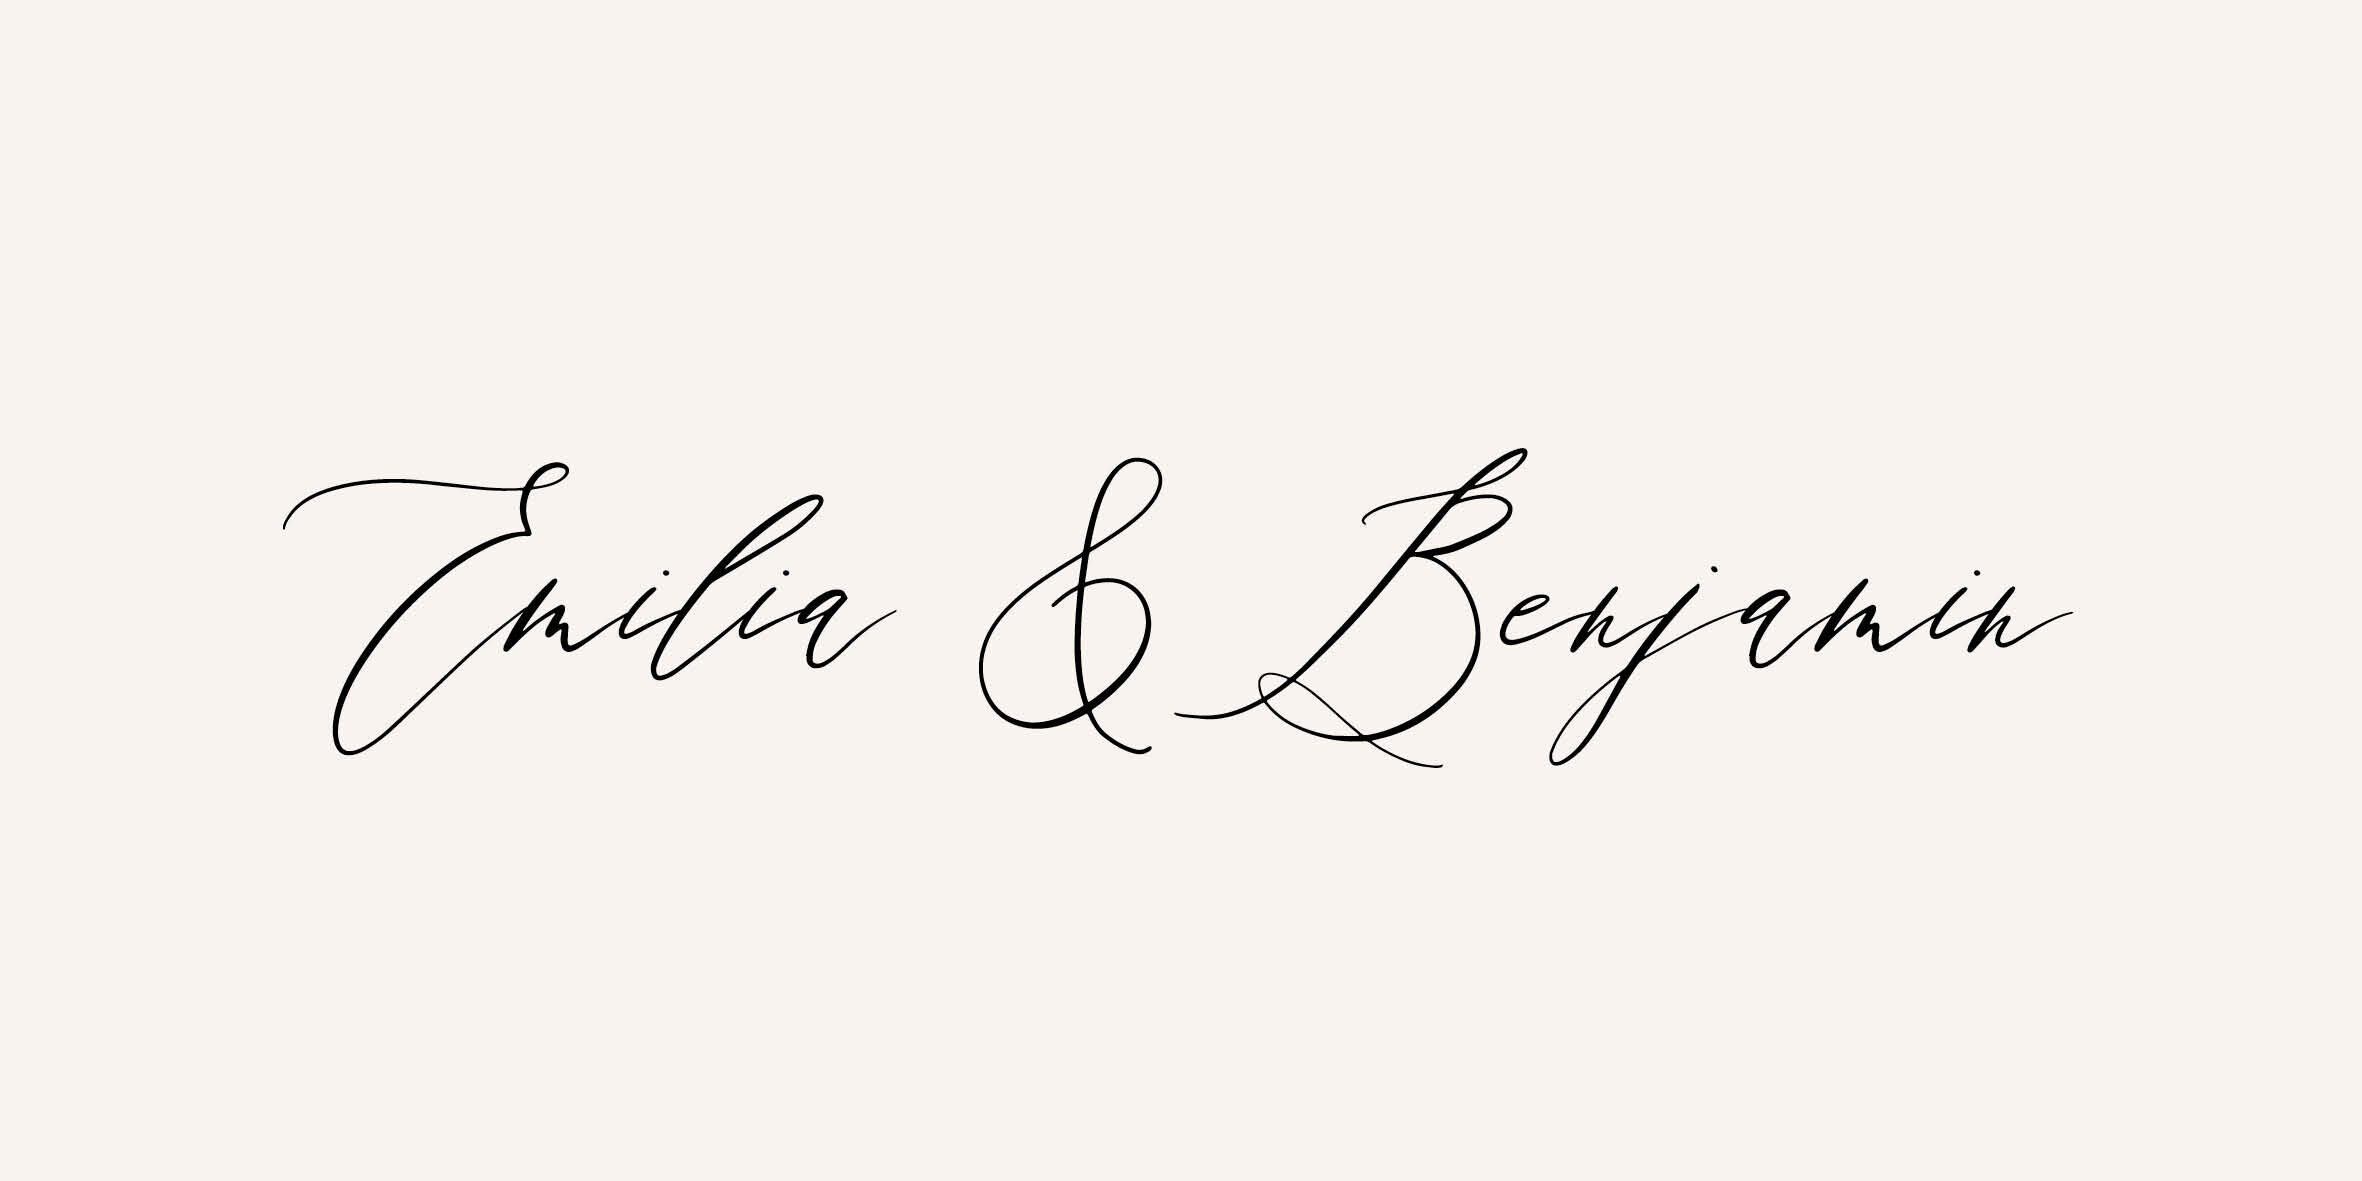 Font styles_calligraphy5.jpg